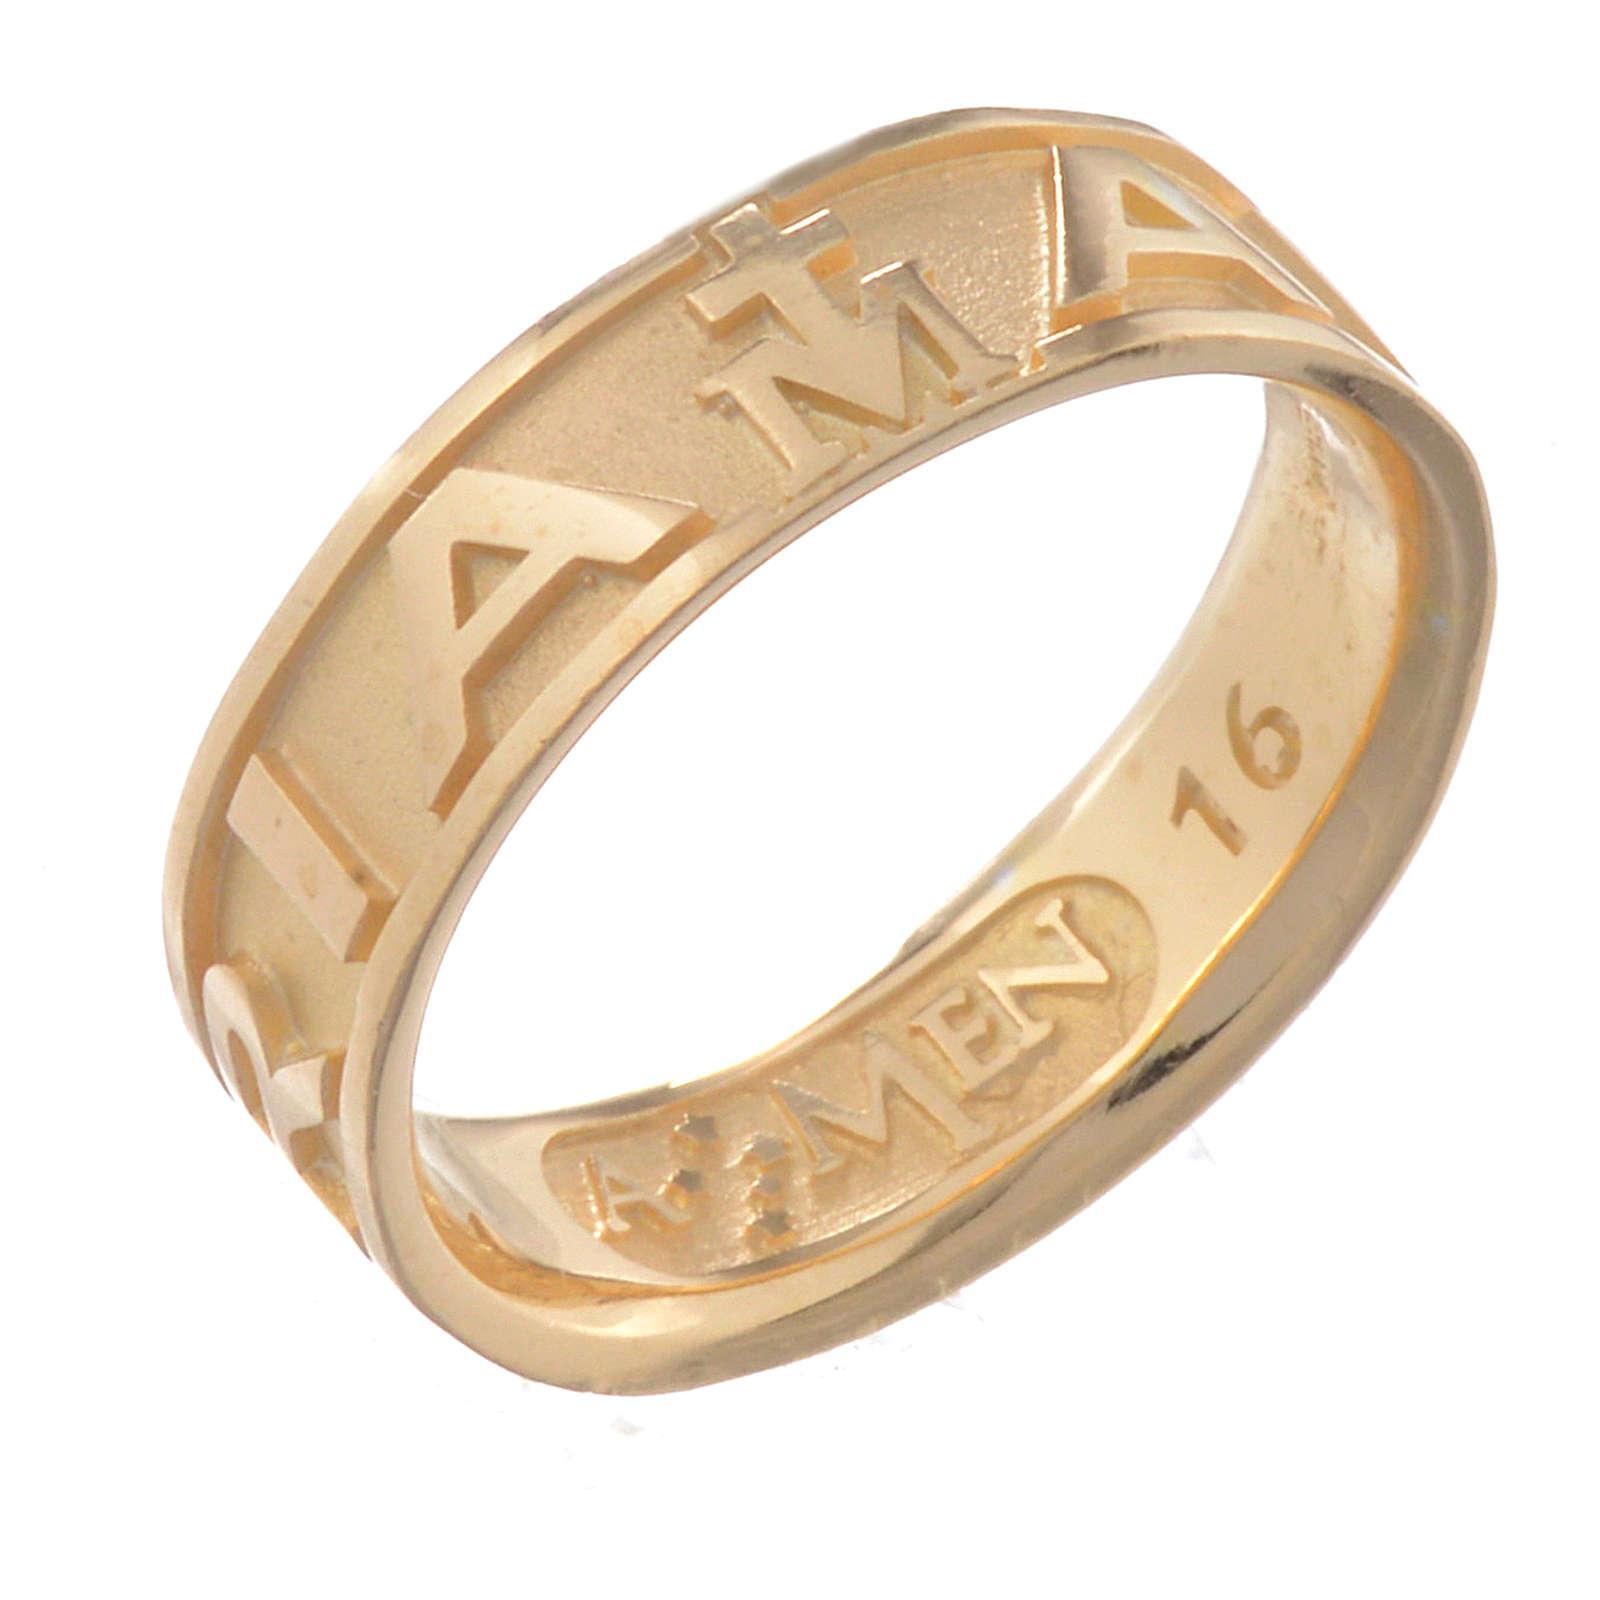 Ring AMEN Hail Mary silver 925, Gold finish 3